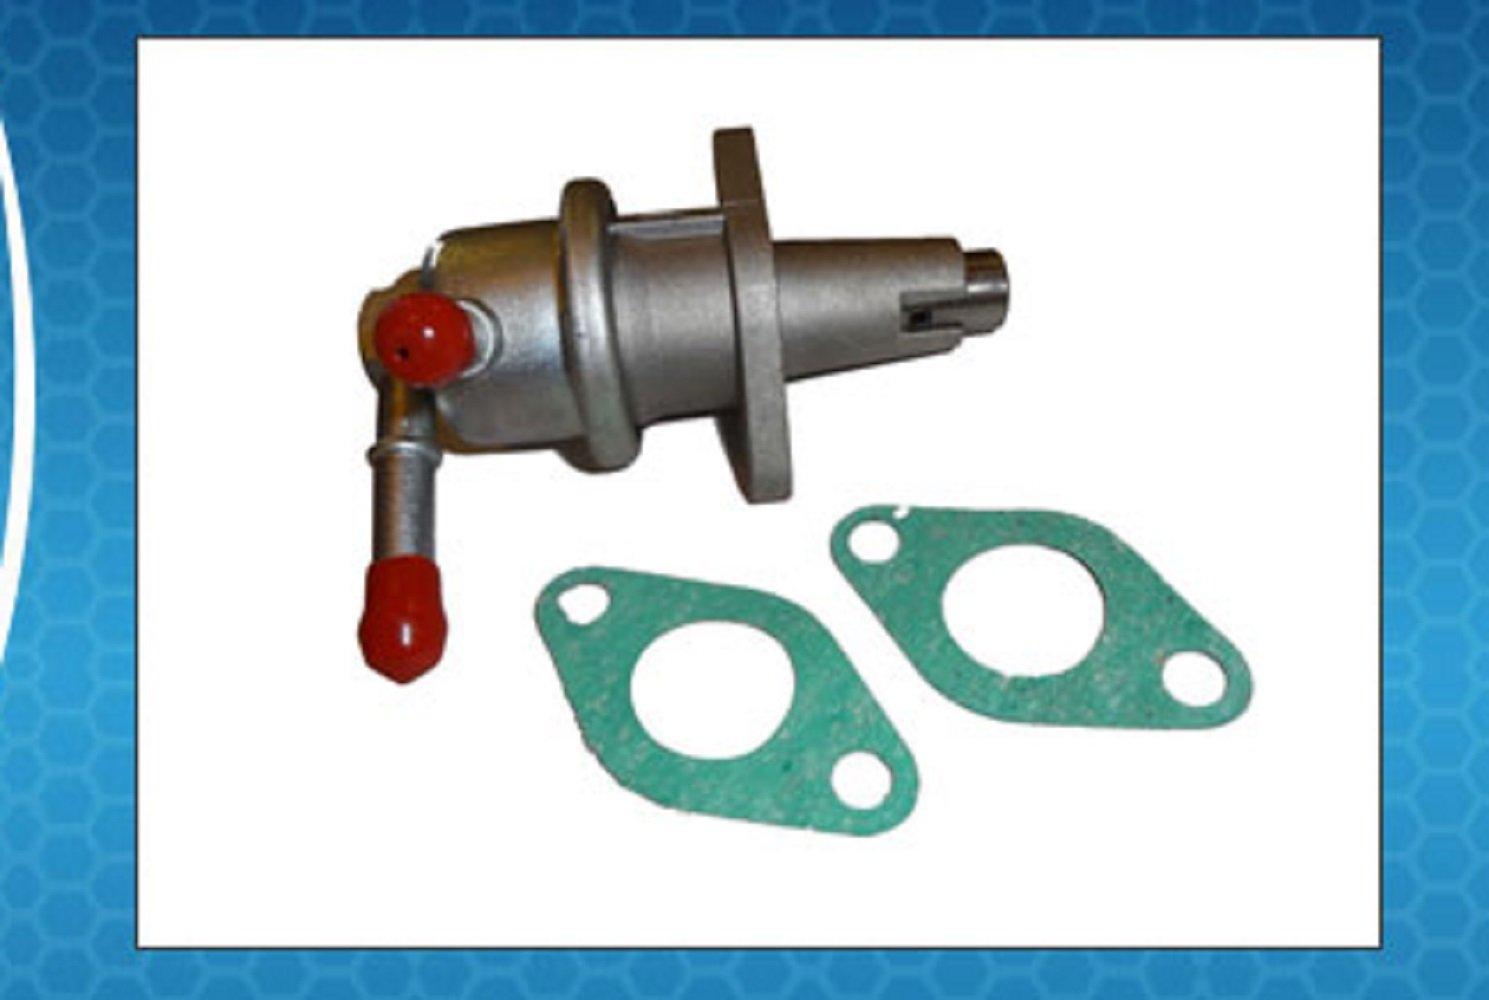 Kubota D722 Workshop Manual Ebook Df750 Engine Parts Diagram Array Fuel Pump Trusted Wiring Diagrams Rh Hamze Co